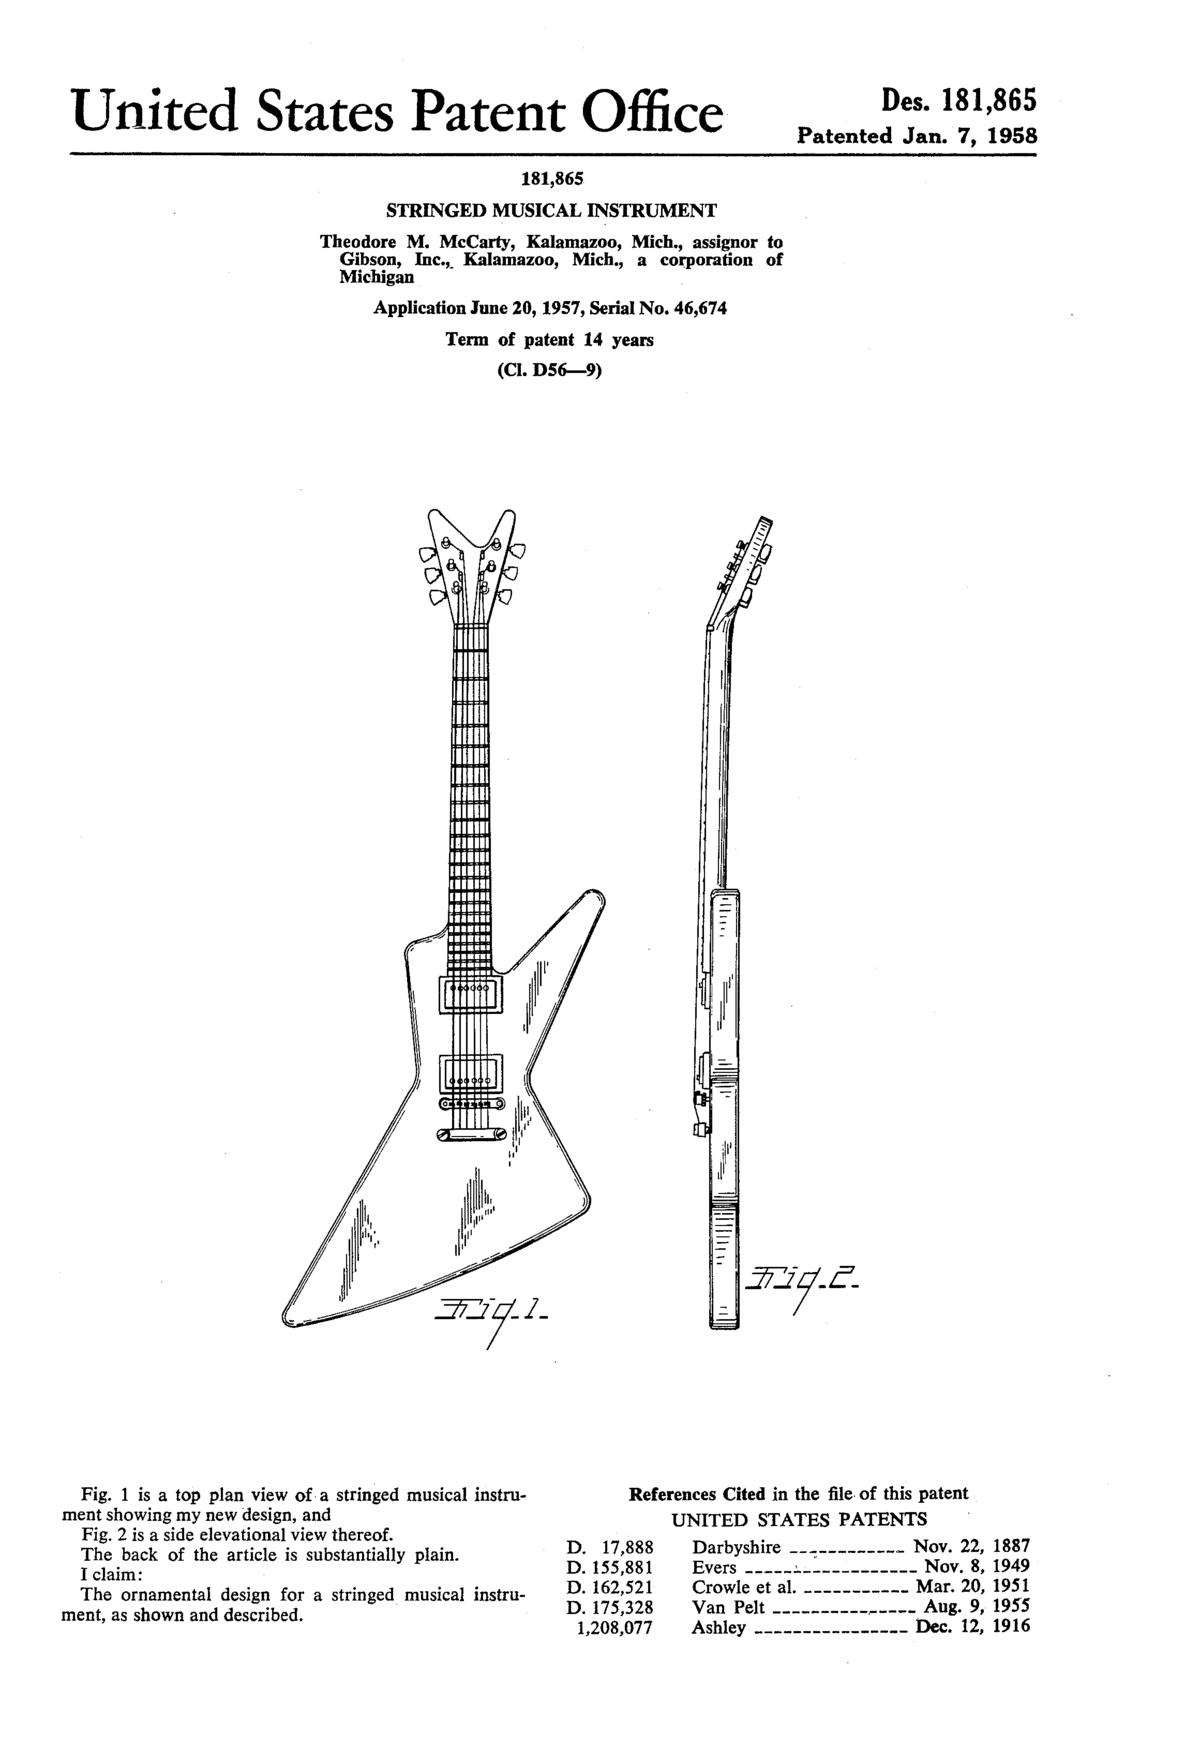 Gibson Kalamazoo B Guitar Wiring Diagram Values For Explorer Futura Wikipedia On Melody Maker